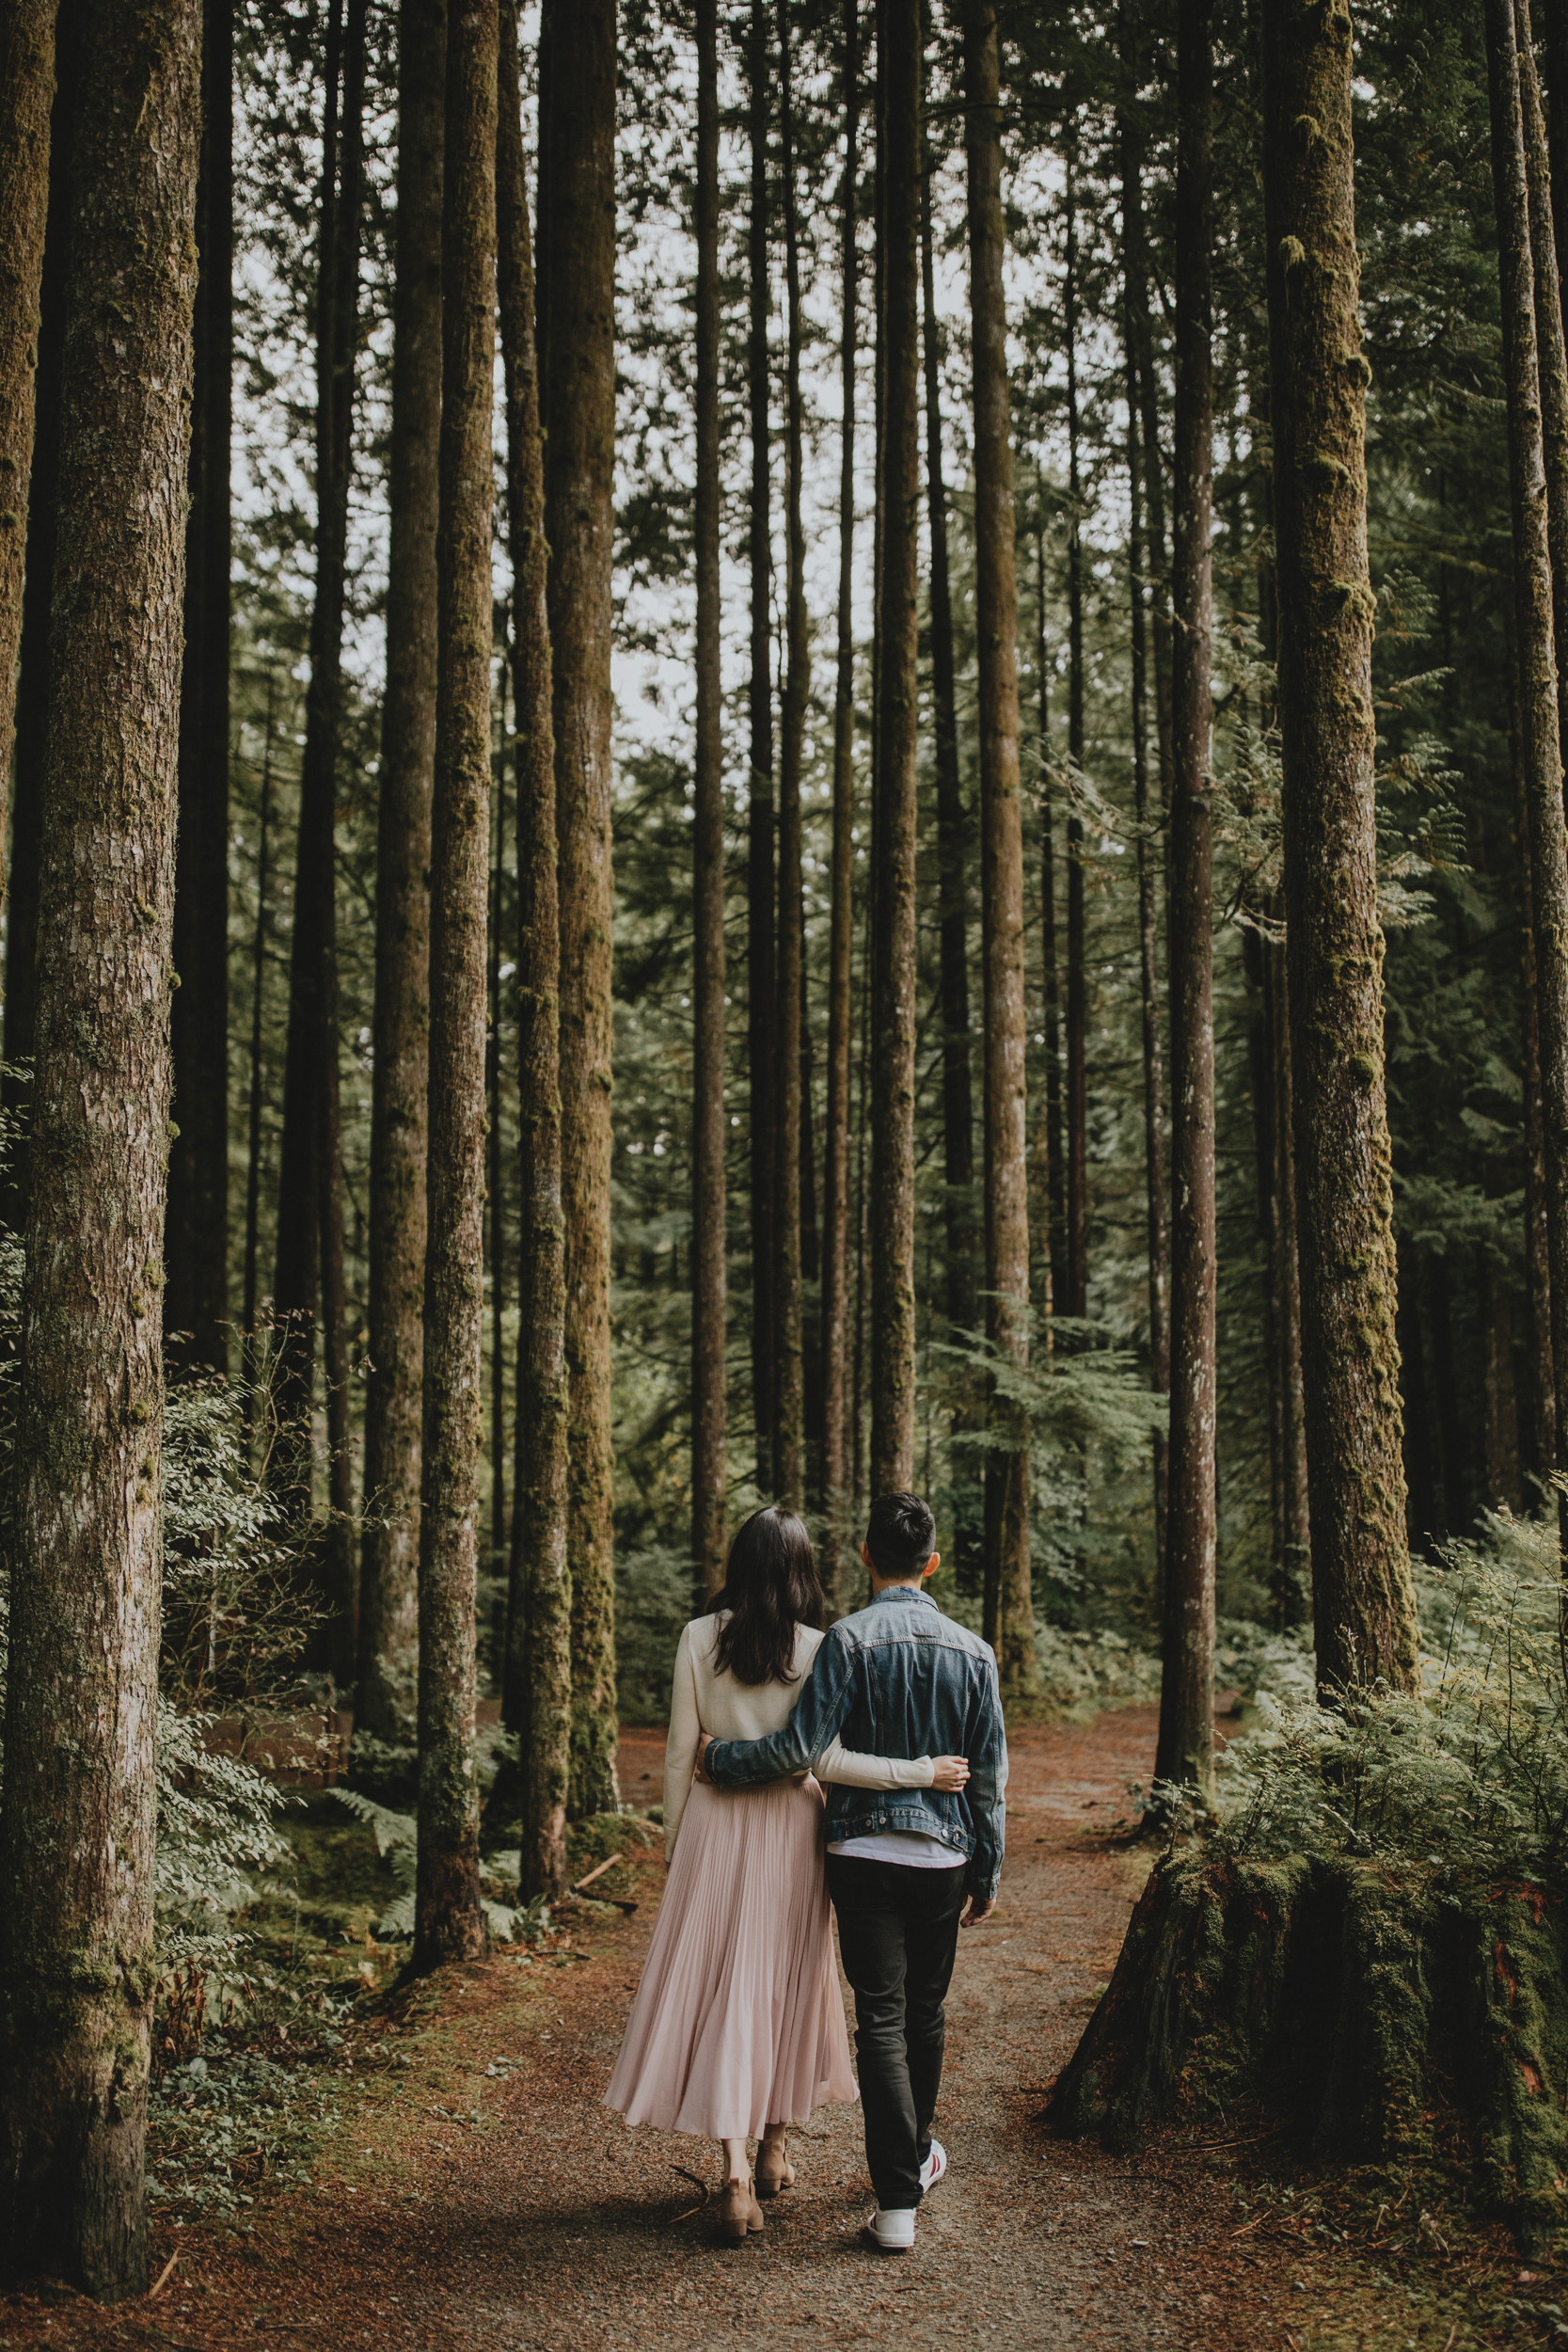 Golden-Ears-Park-Forest-Engagement-Vancouver-3.jpg